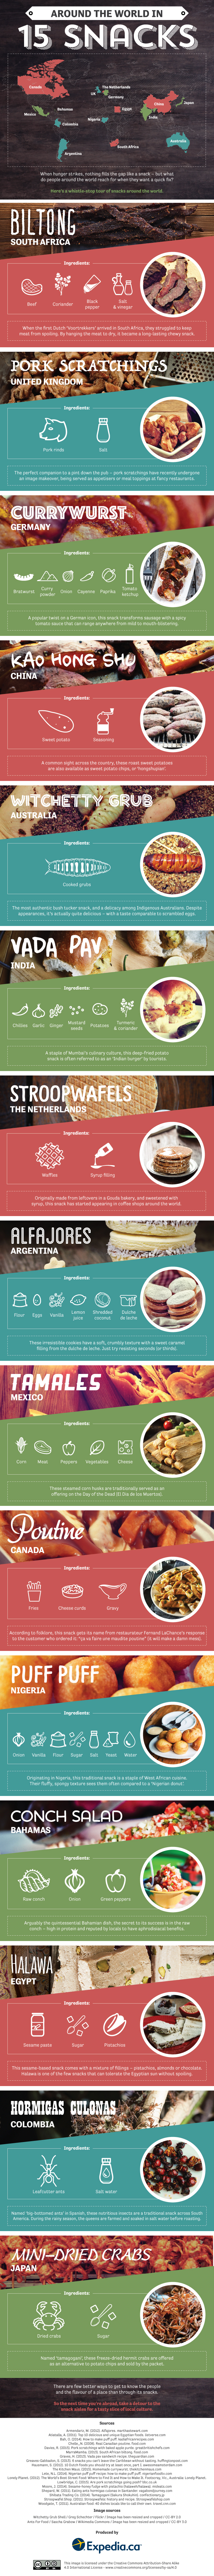 Around-the-world-in-15-snacks